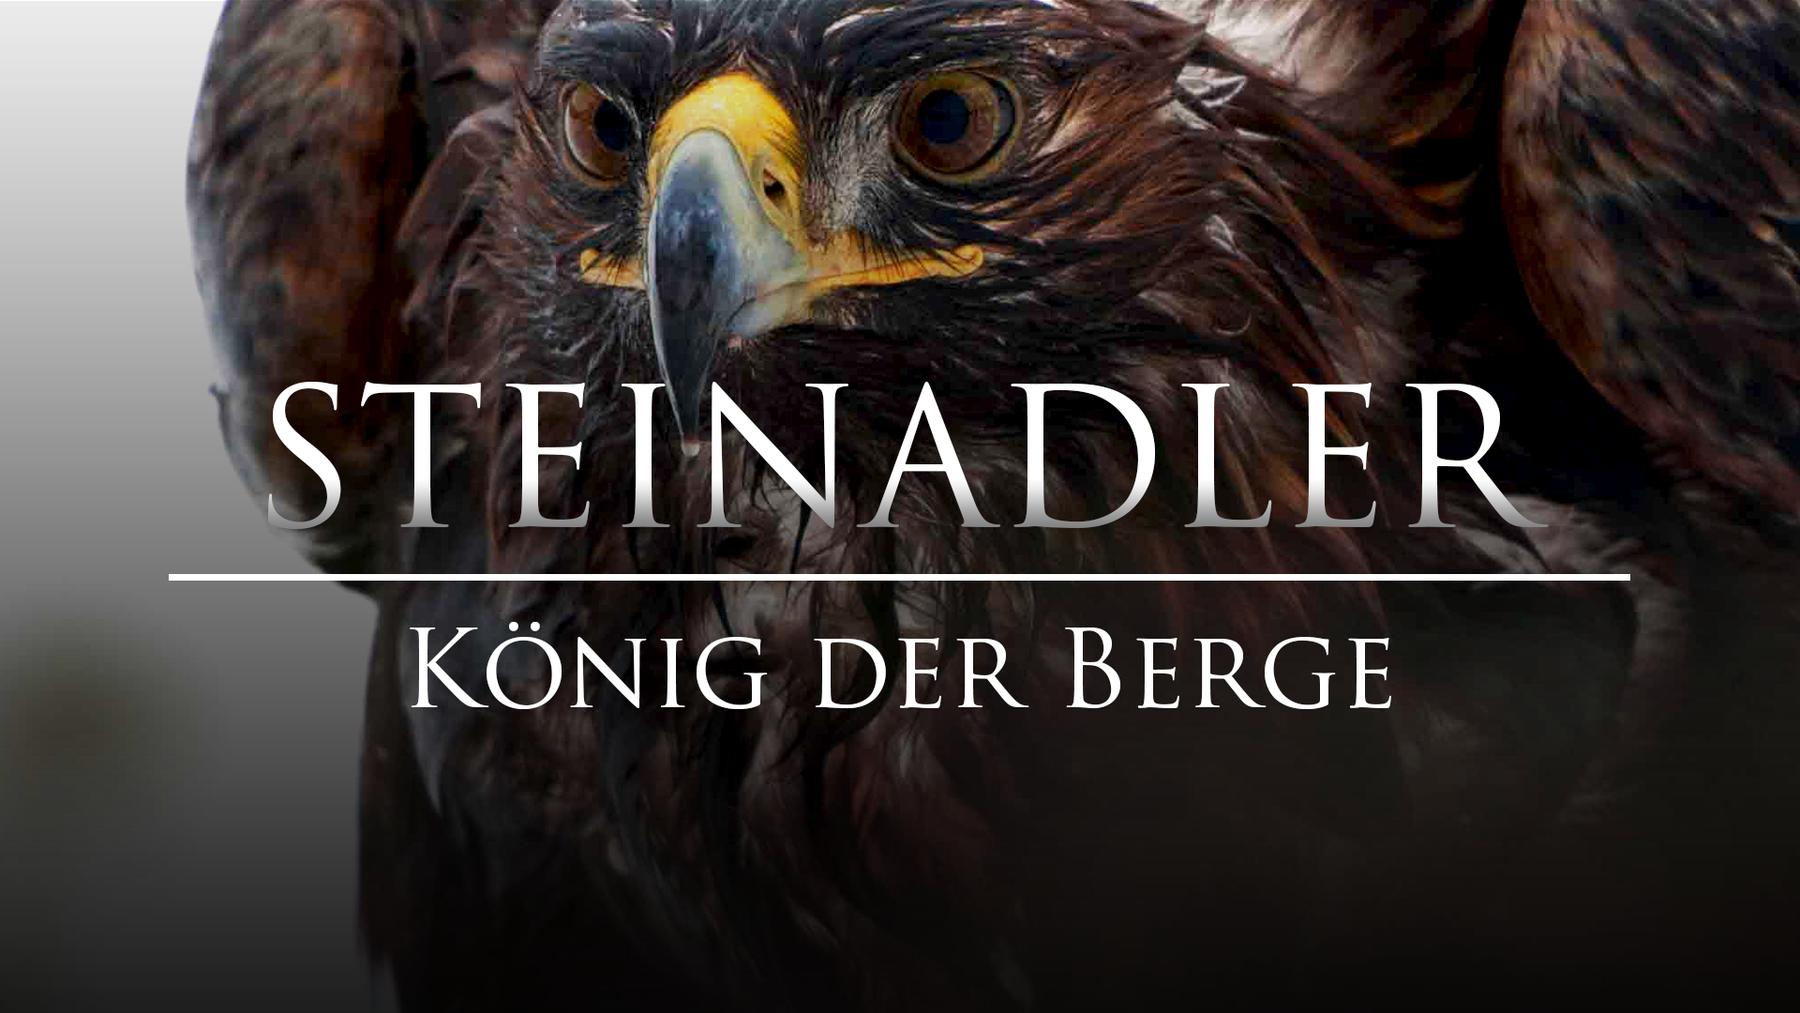 Steinadler - König der Berge